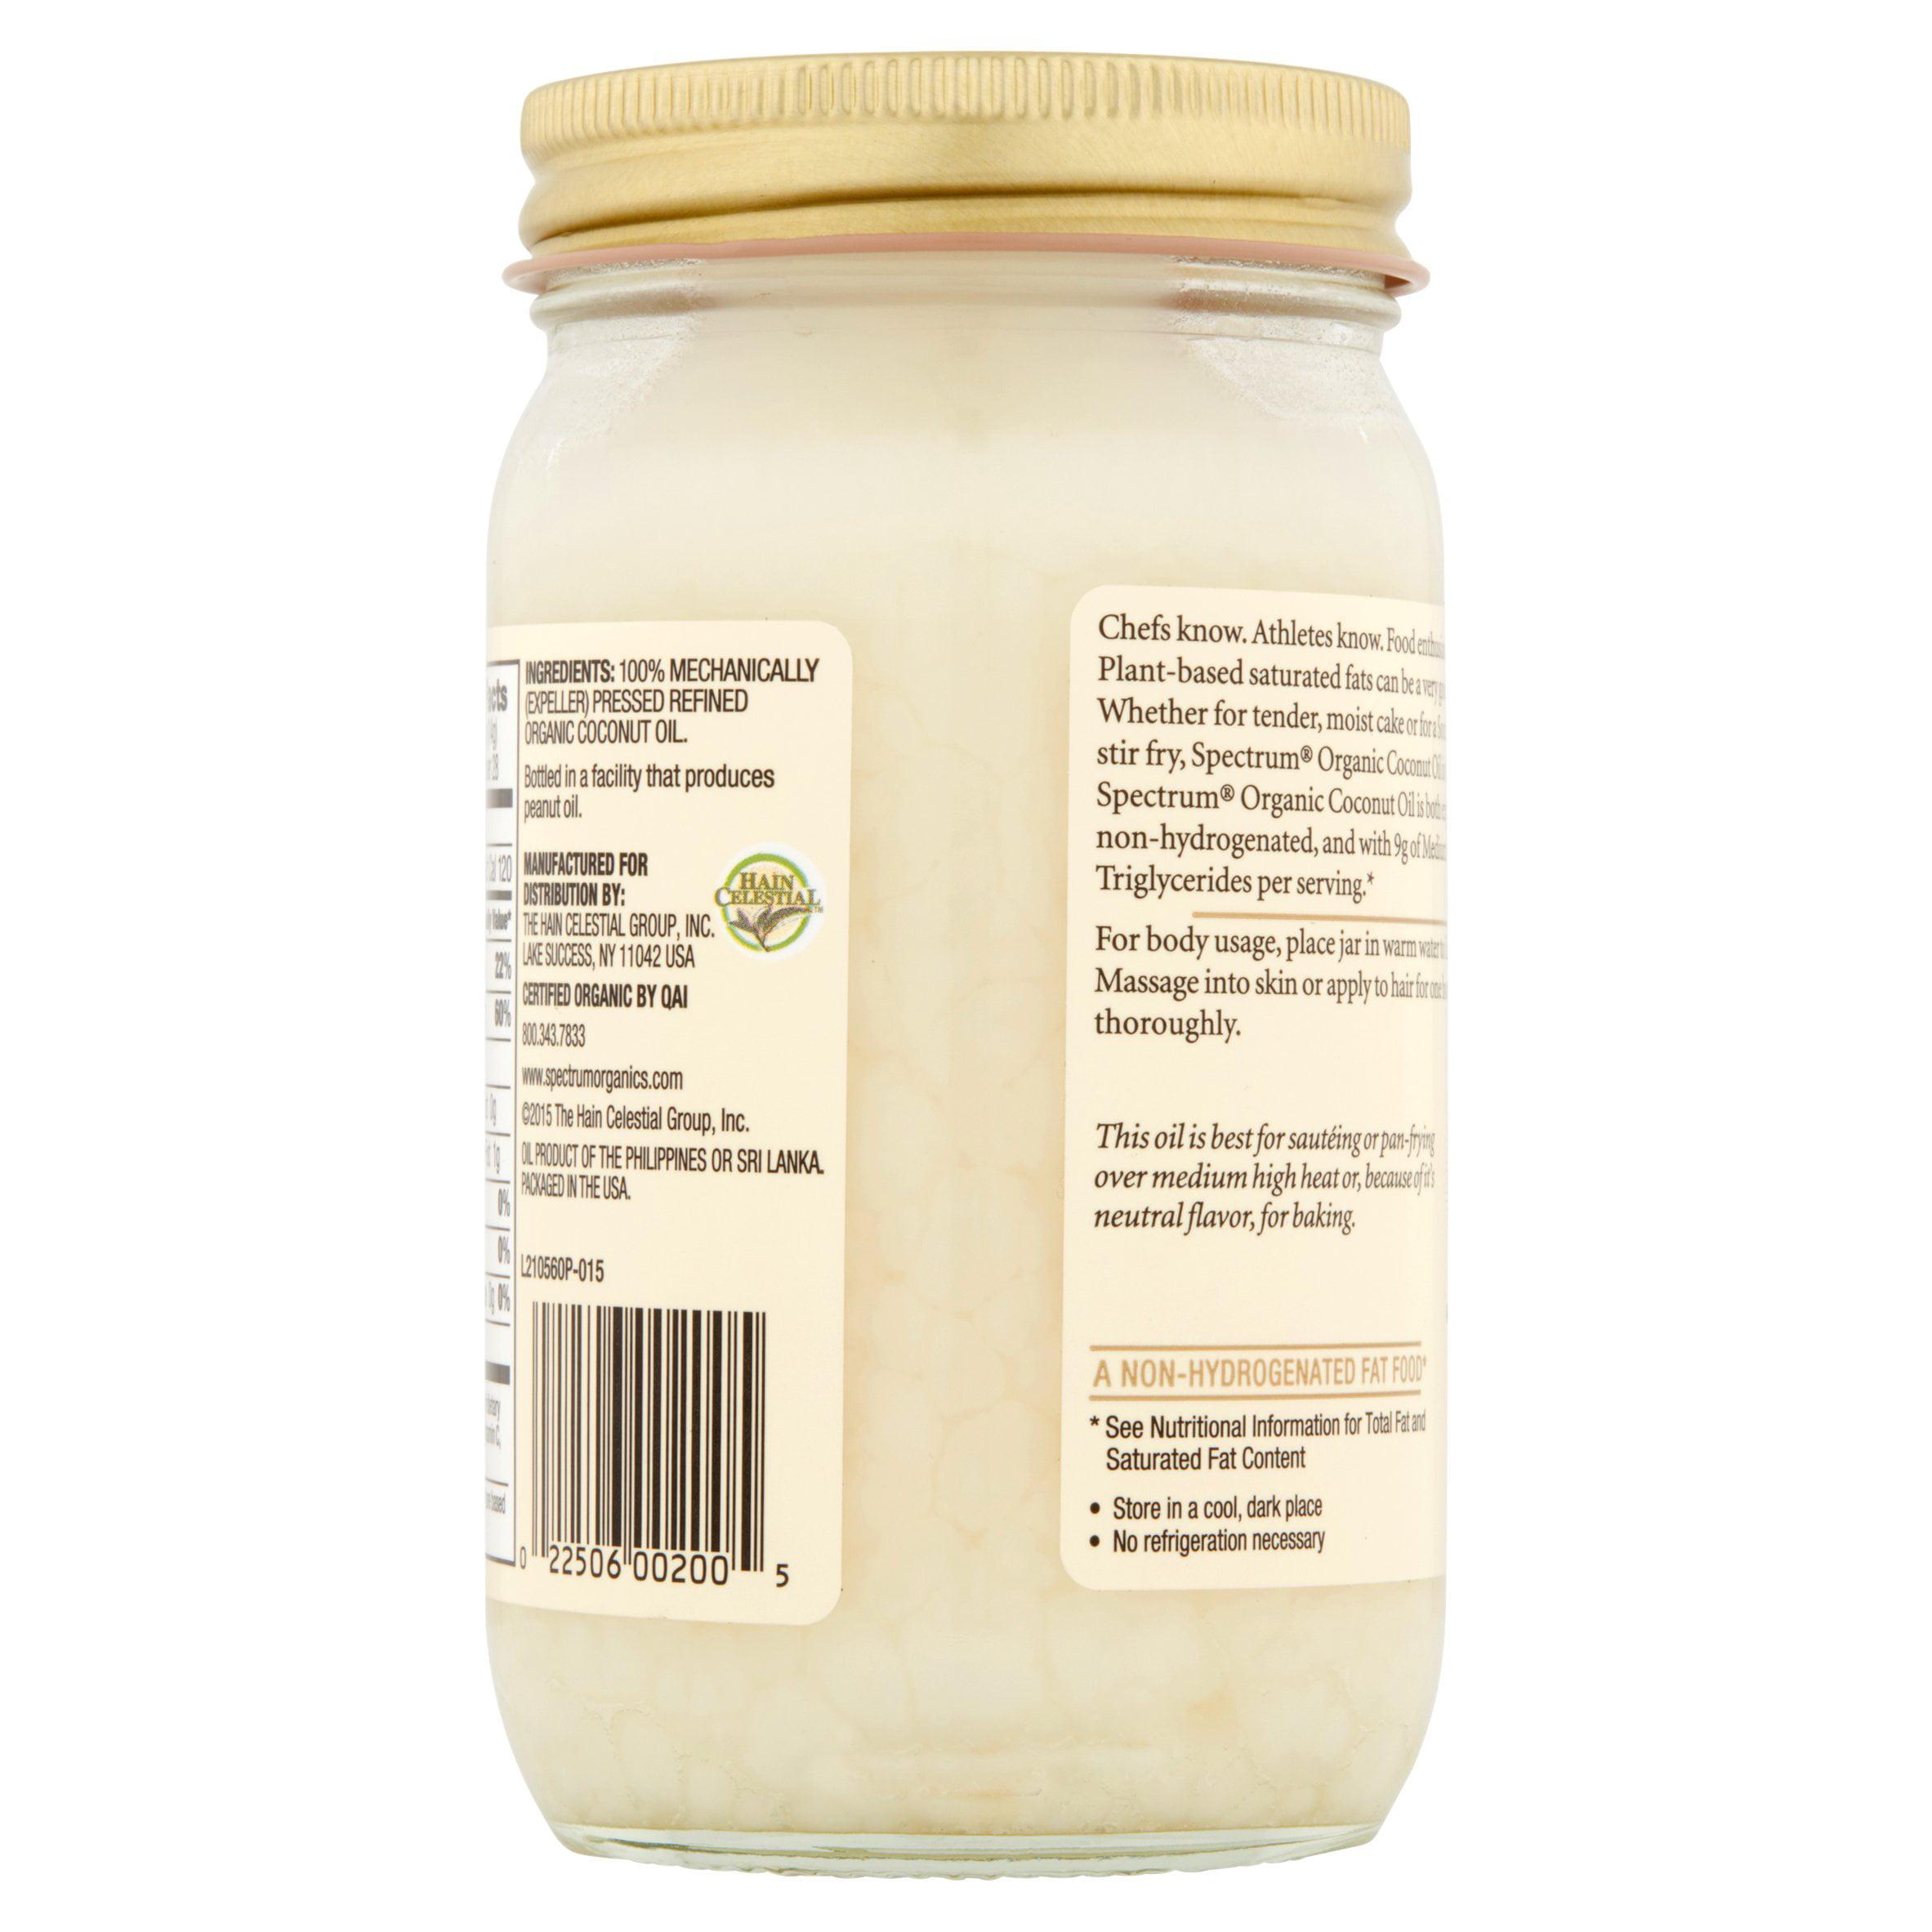 Spectrum Oil Coconut Organic 14 fl oz - 108 Grocery